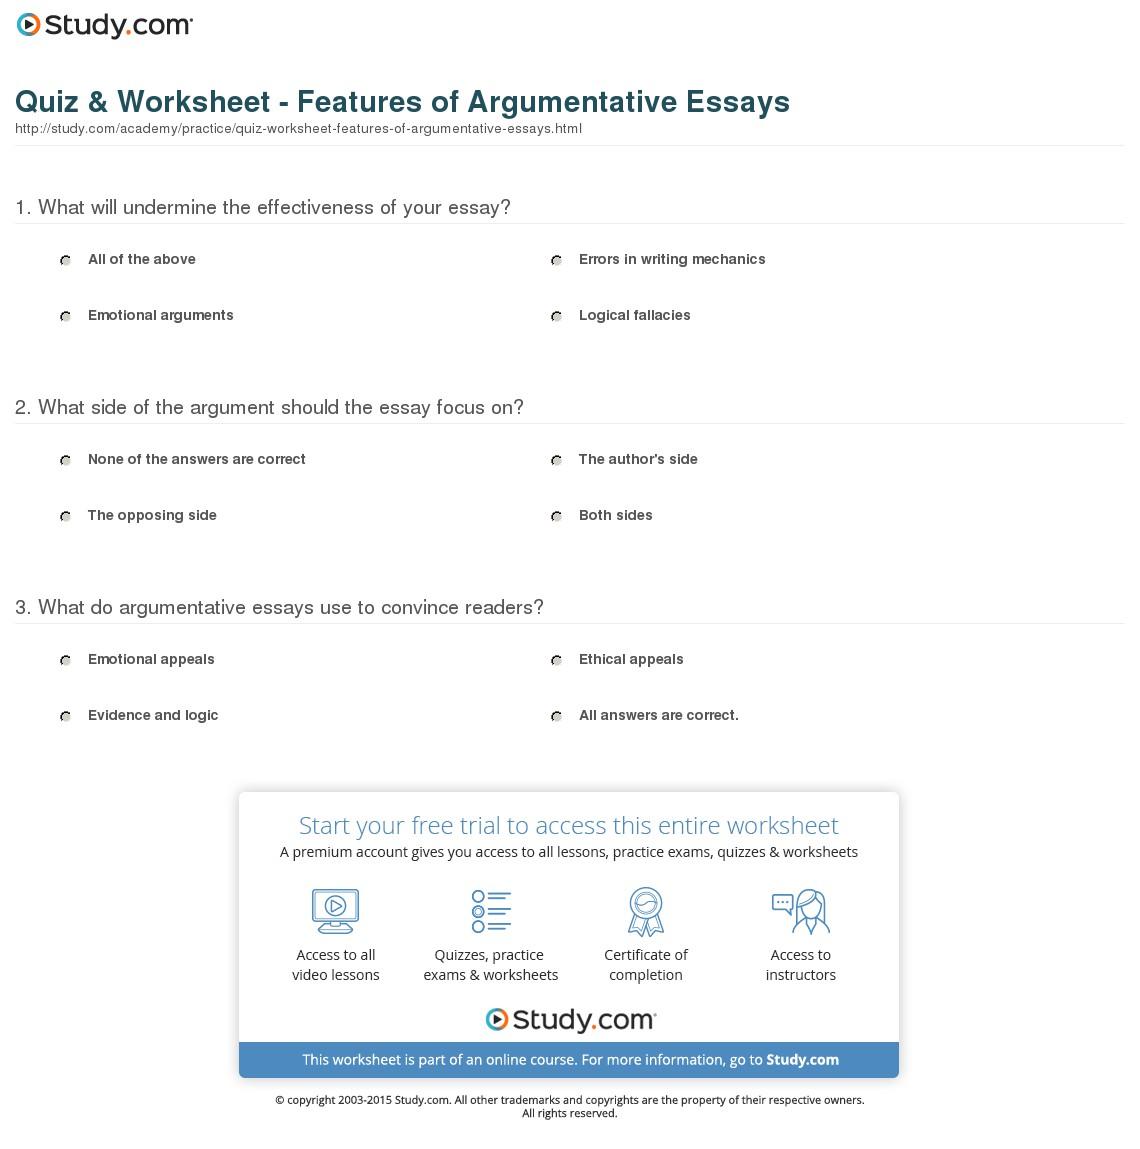 018 Essay Example Argumentative Definition Quiz Worksheet Features Of Fearsome Define Persuasive/argumentative Pdf Full